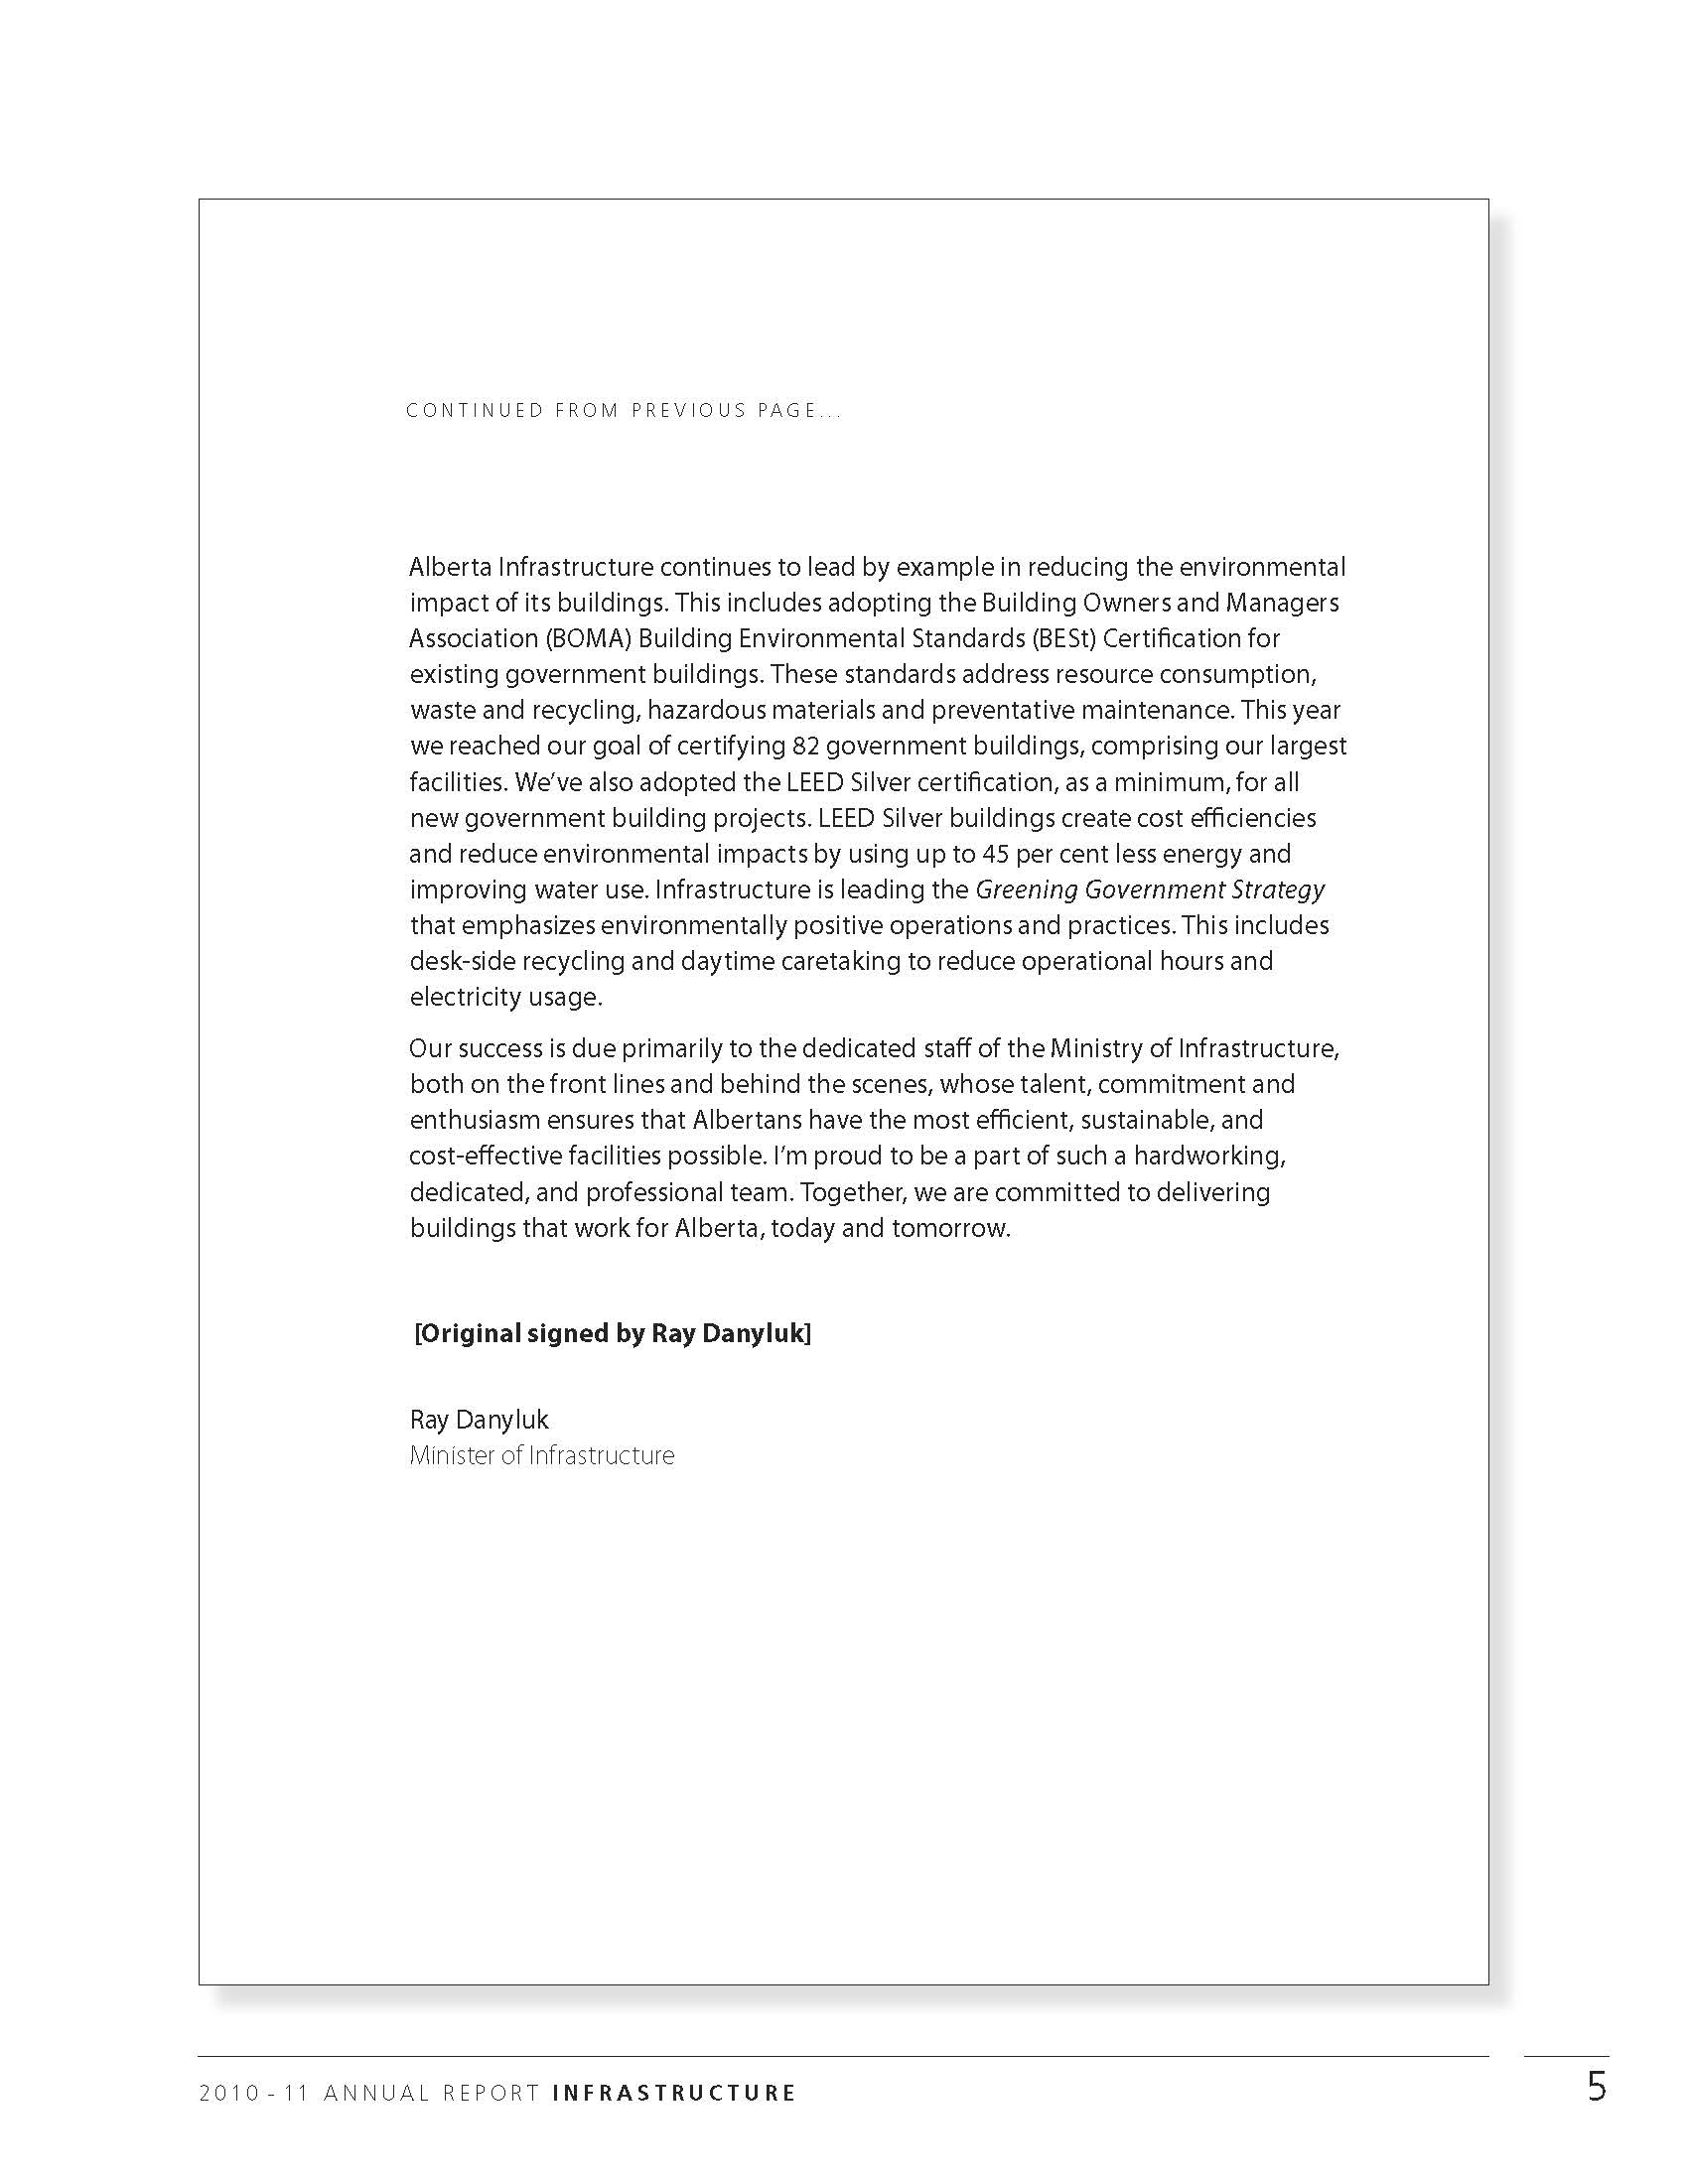 Partial AI annualreport2010-11_Page_2